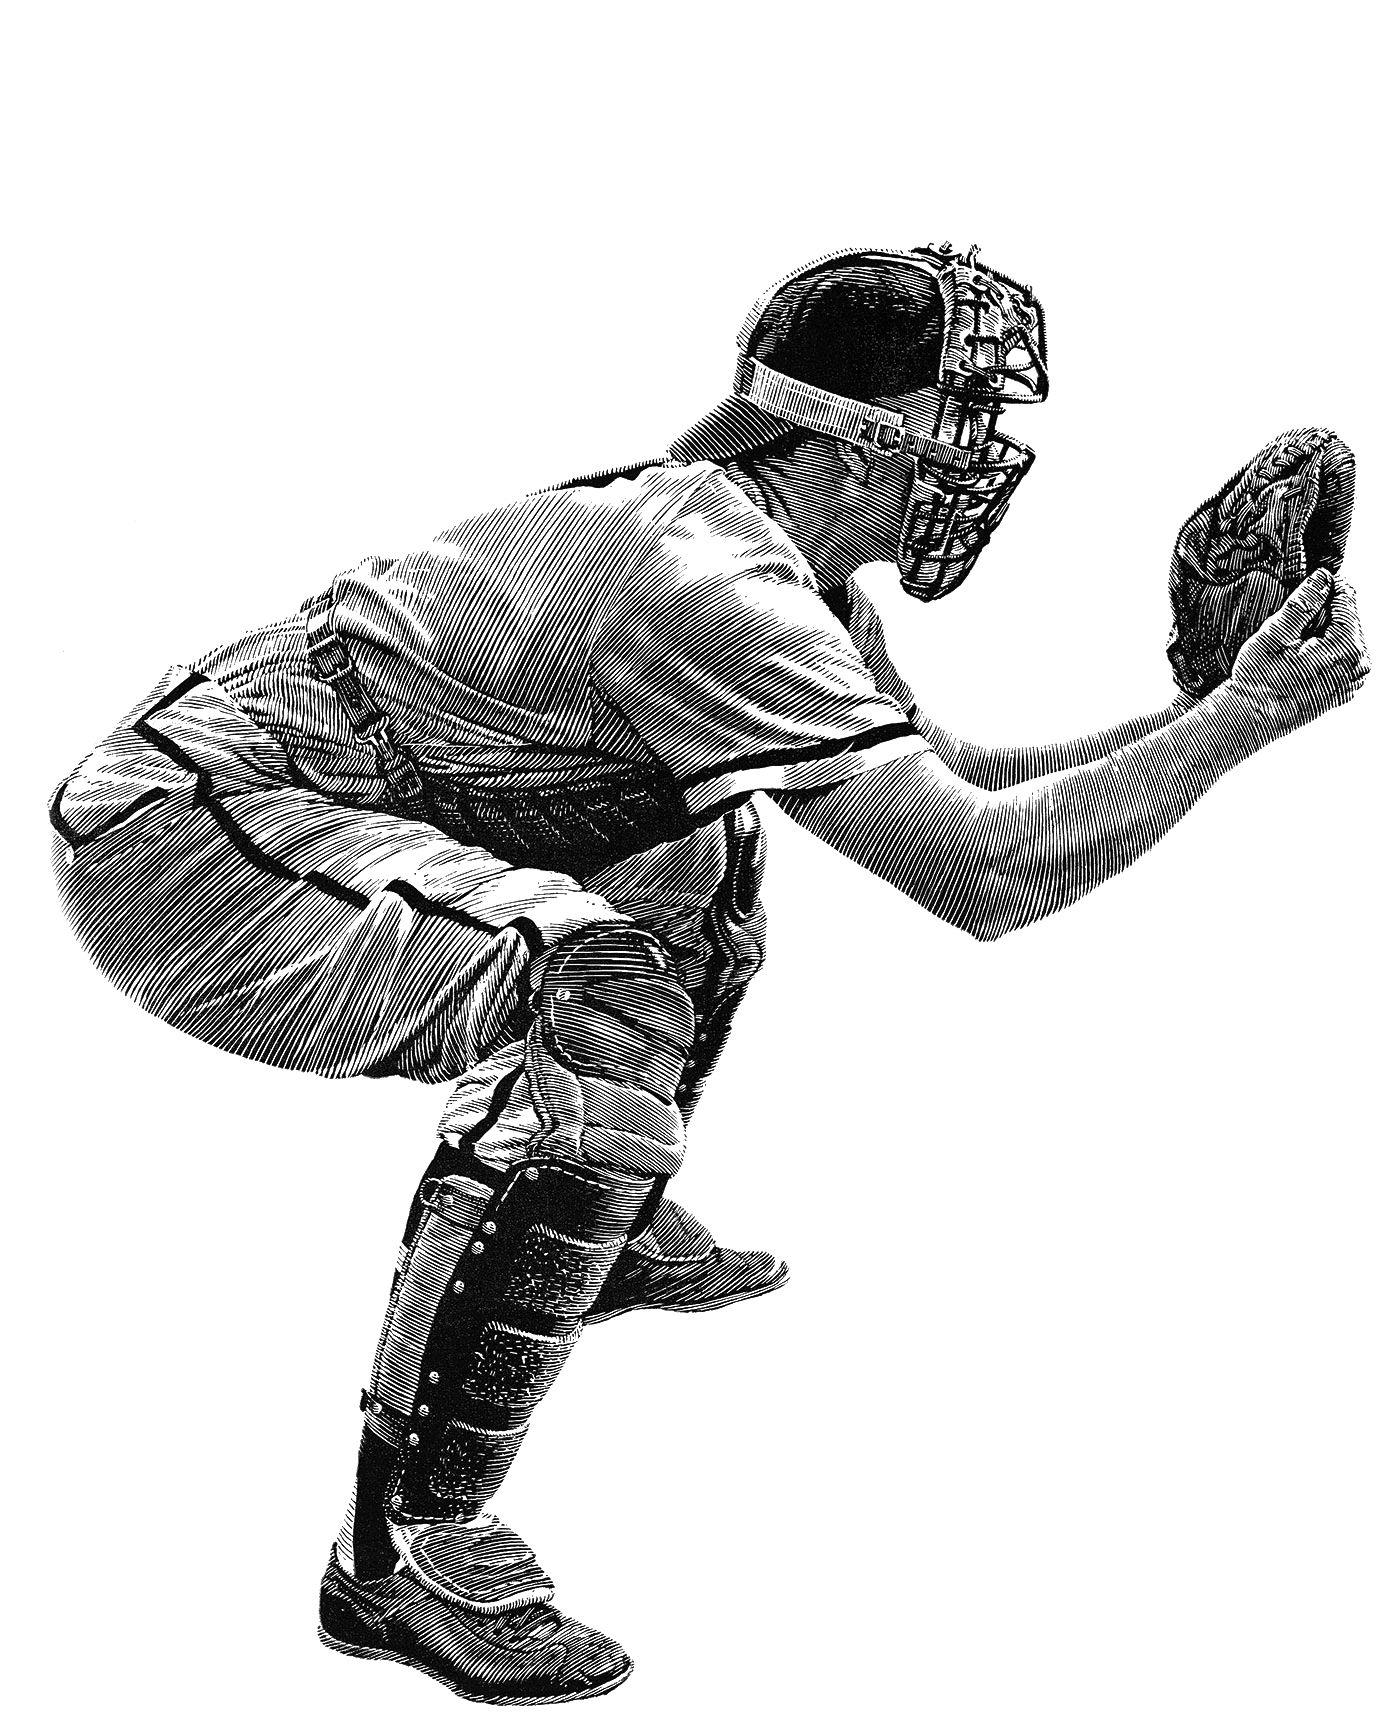 Del Crandall, Milwaukee Braves catcher, illustration by Anthony Ravielli,  1958 | Sports art, Baseball art, Baseball catcher